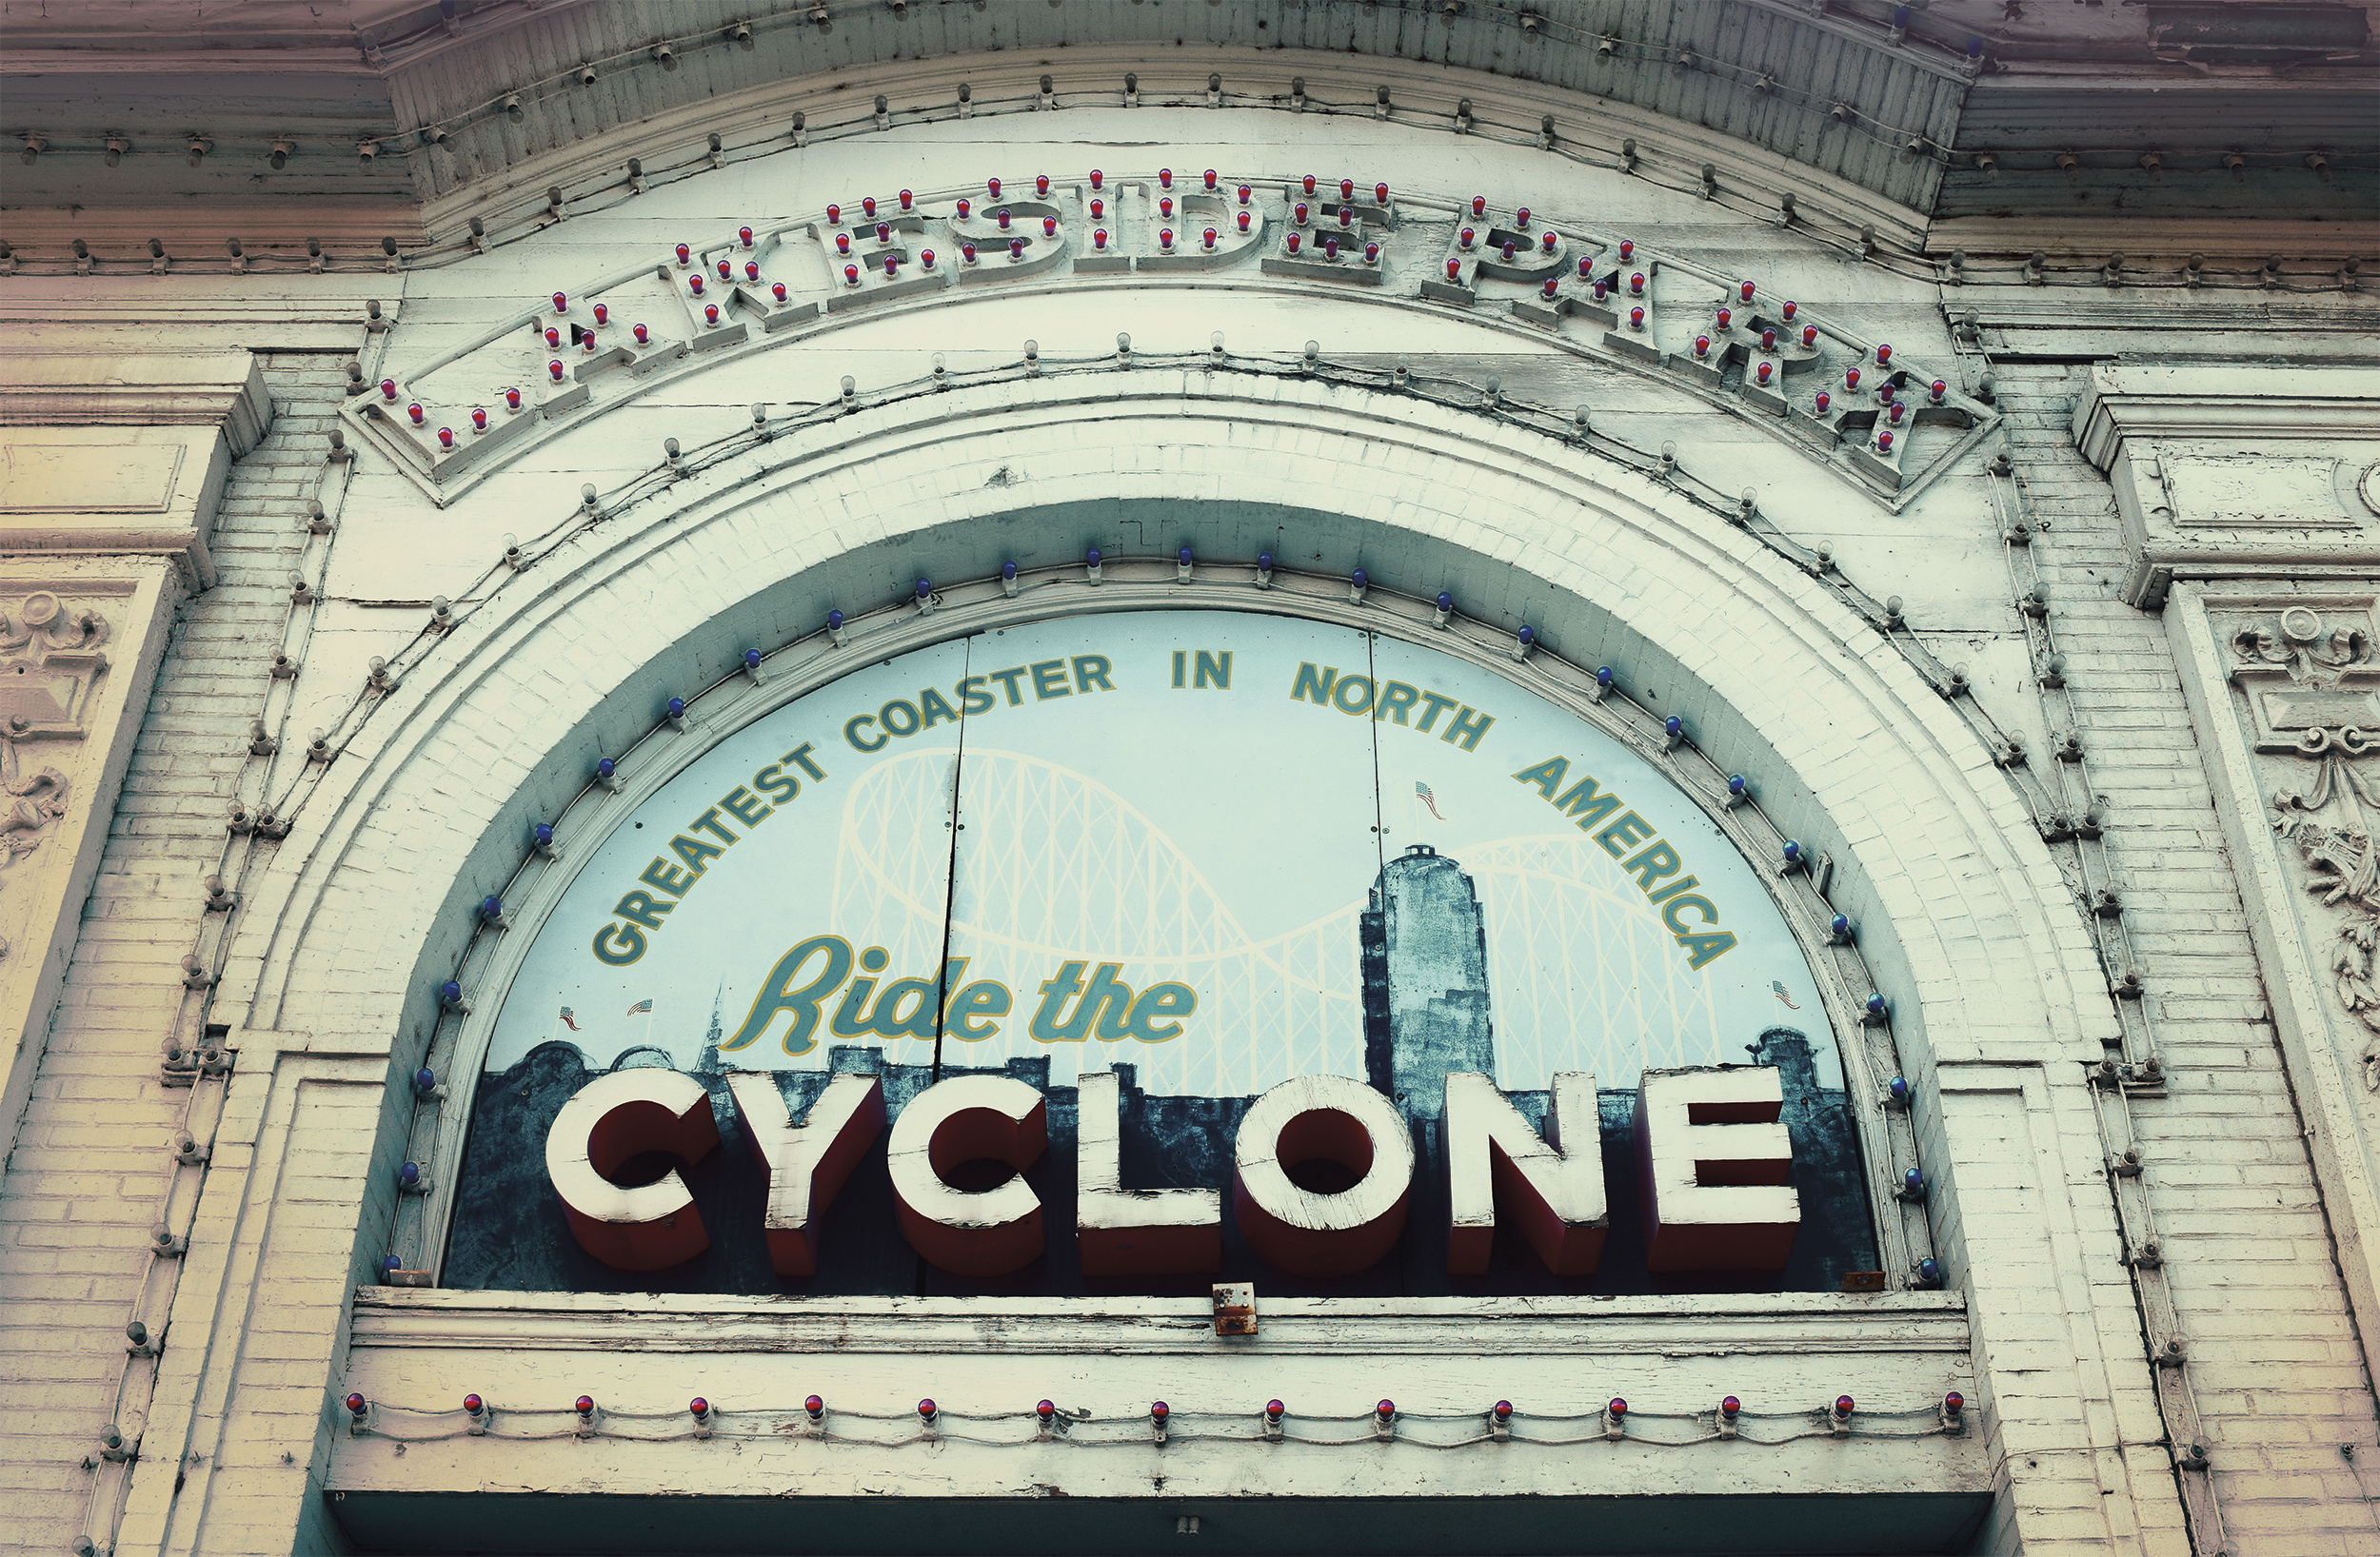 cyclone_sign.jpg